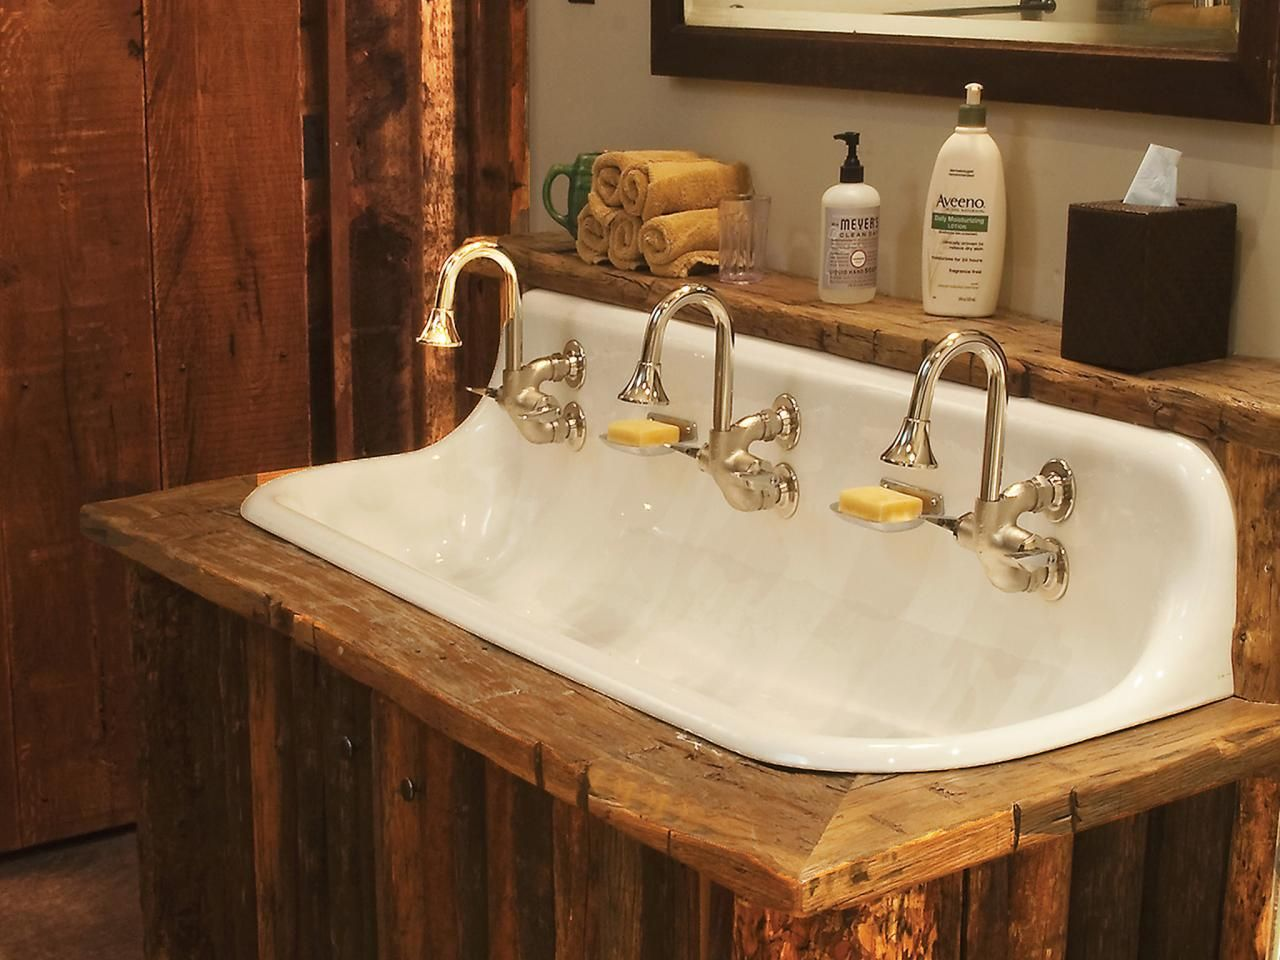 Antique Bathroom Fixtures Vintage Bathroom Sinks Bathroom